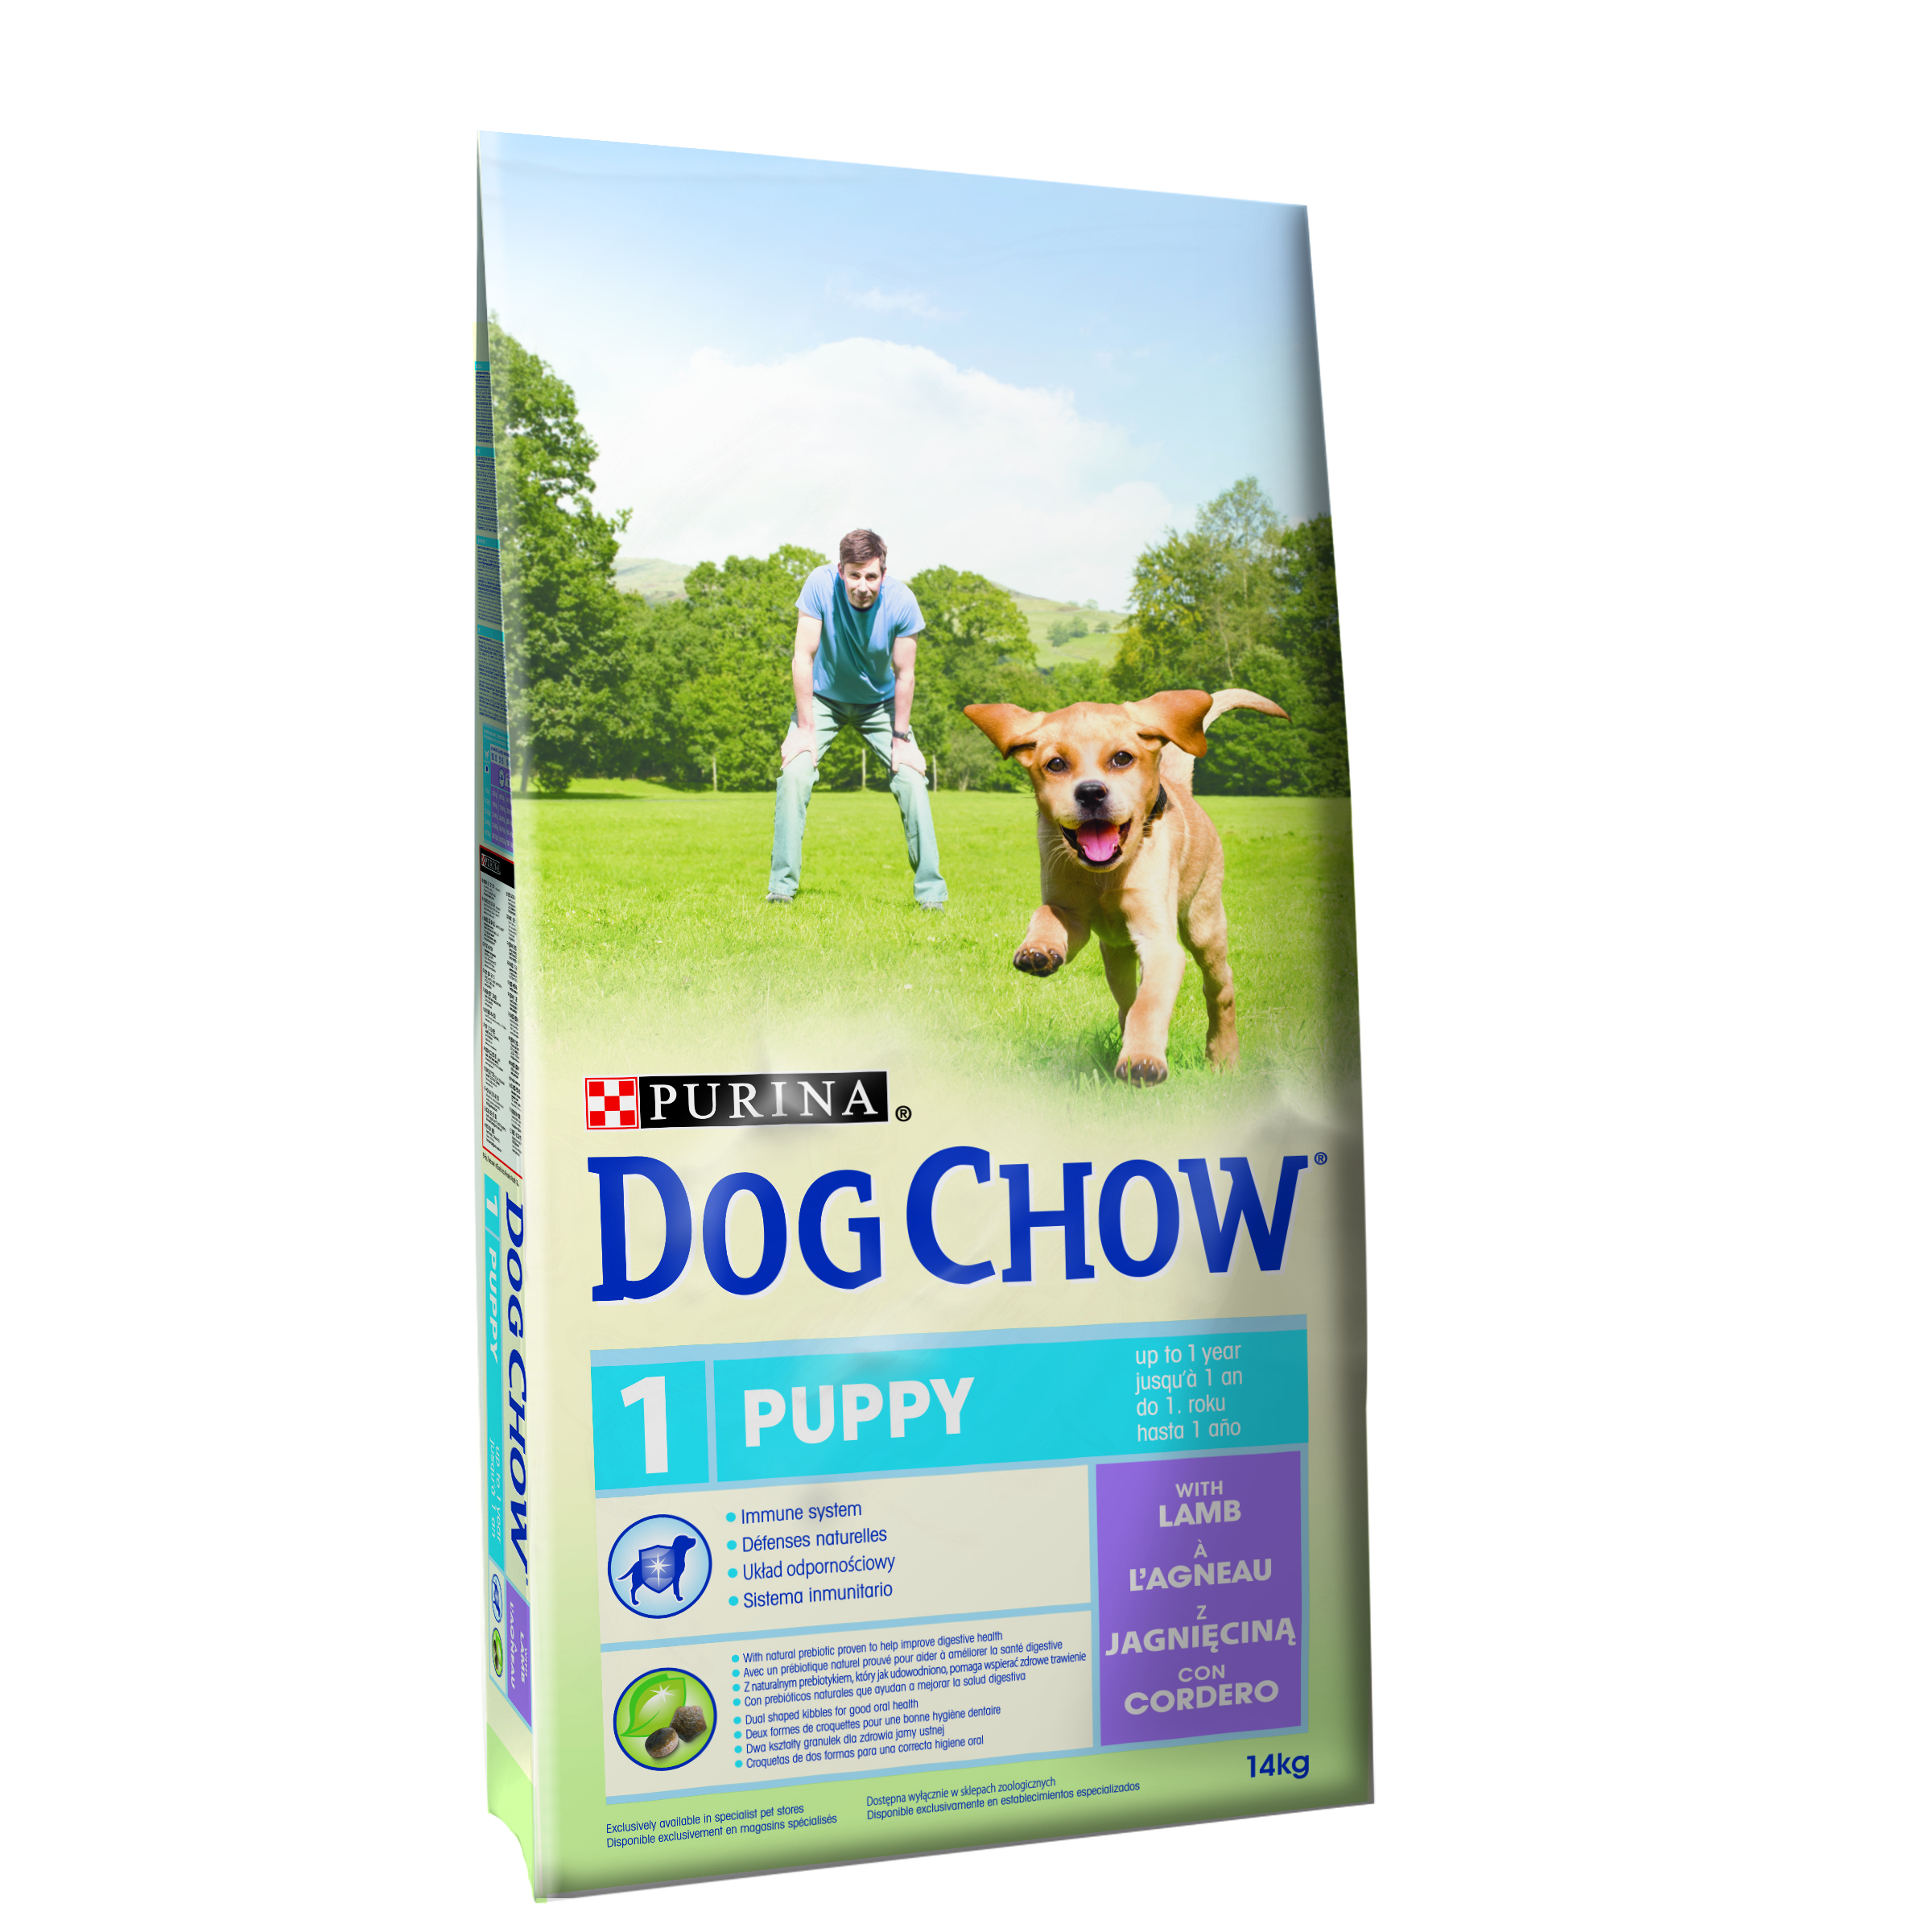 Purina Dog Chow Puppy Lamb&Rice 14 Kg